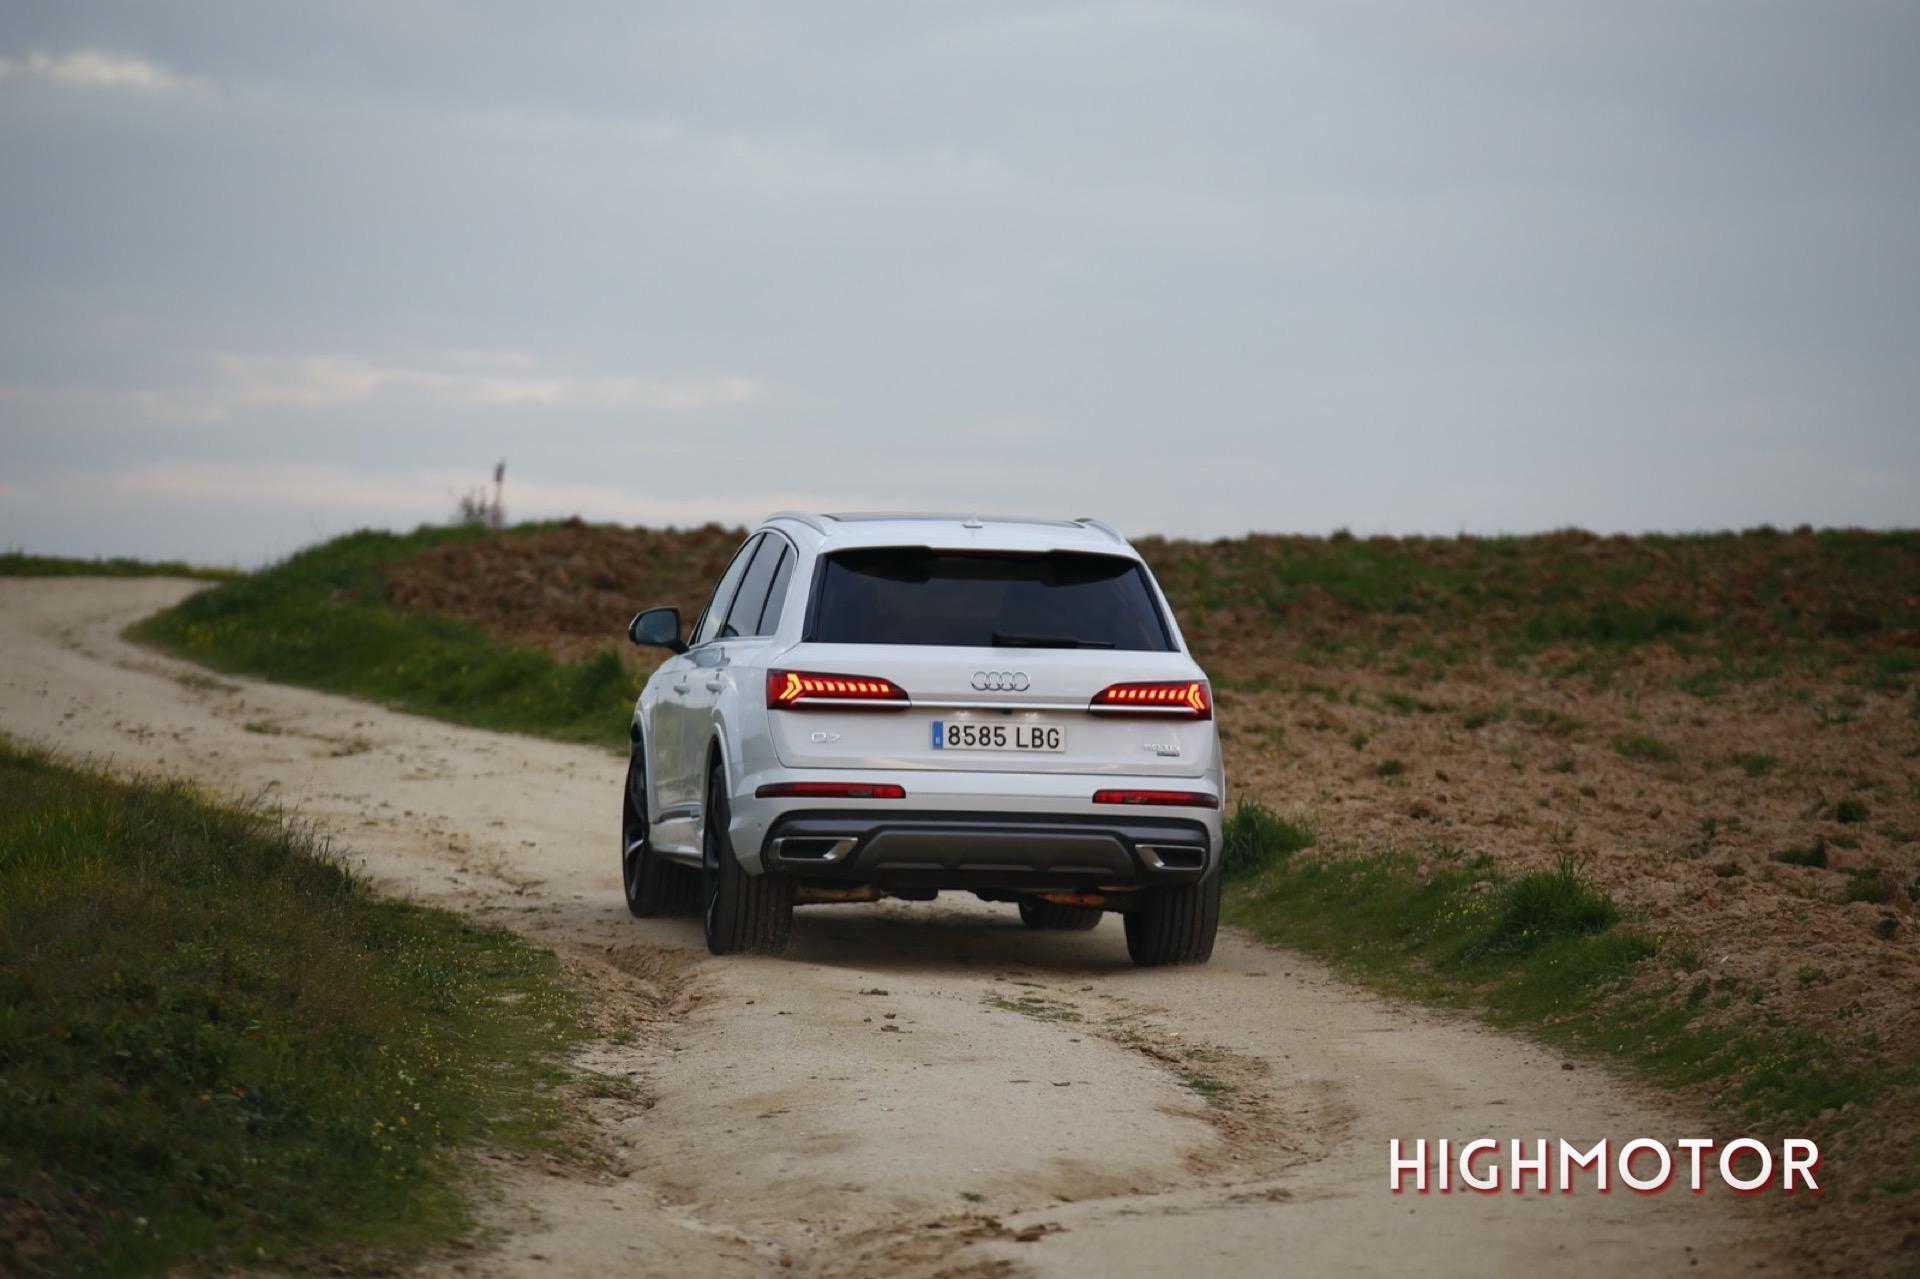 Audi Q7 Tdi 6